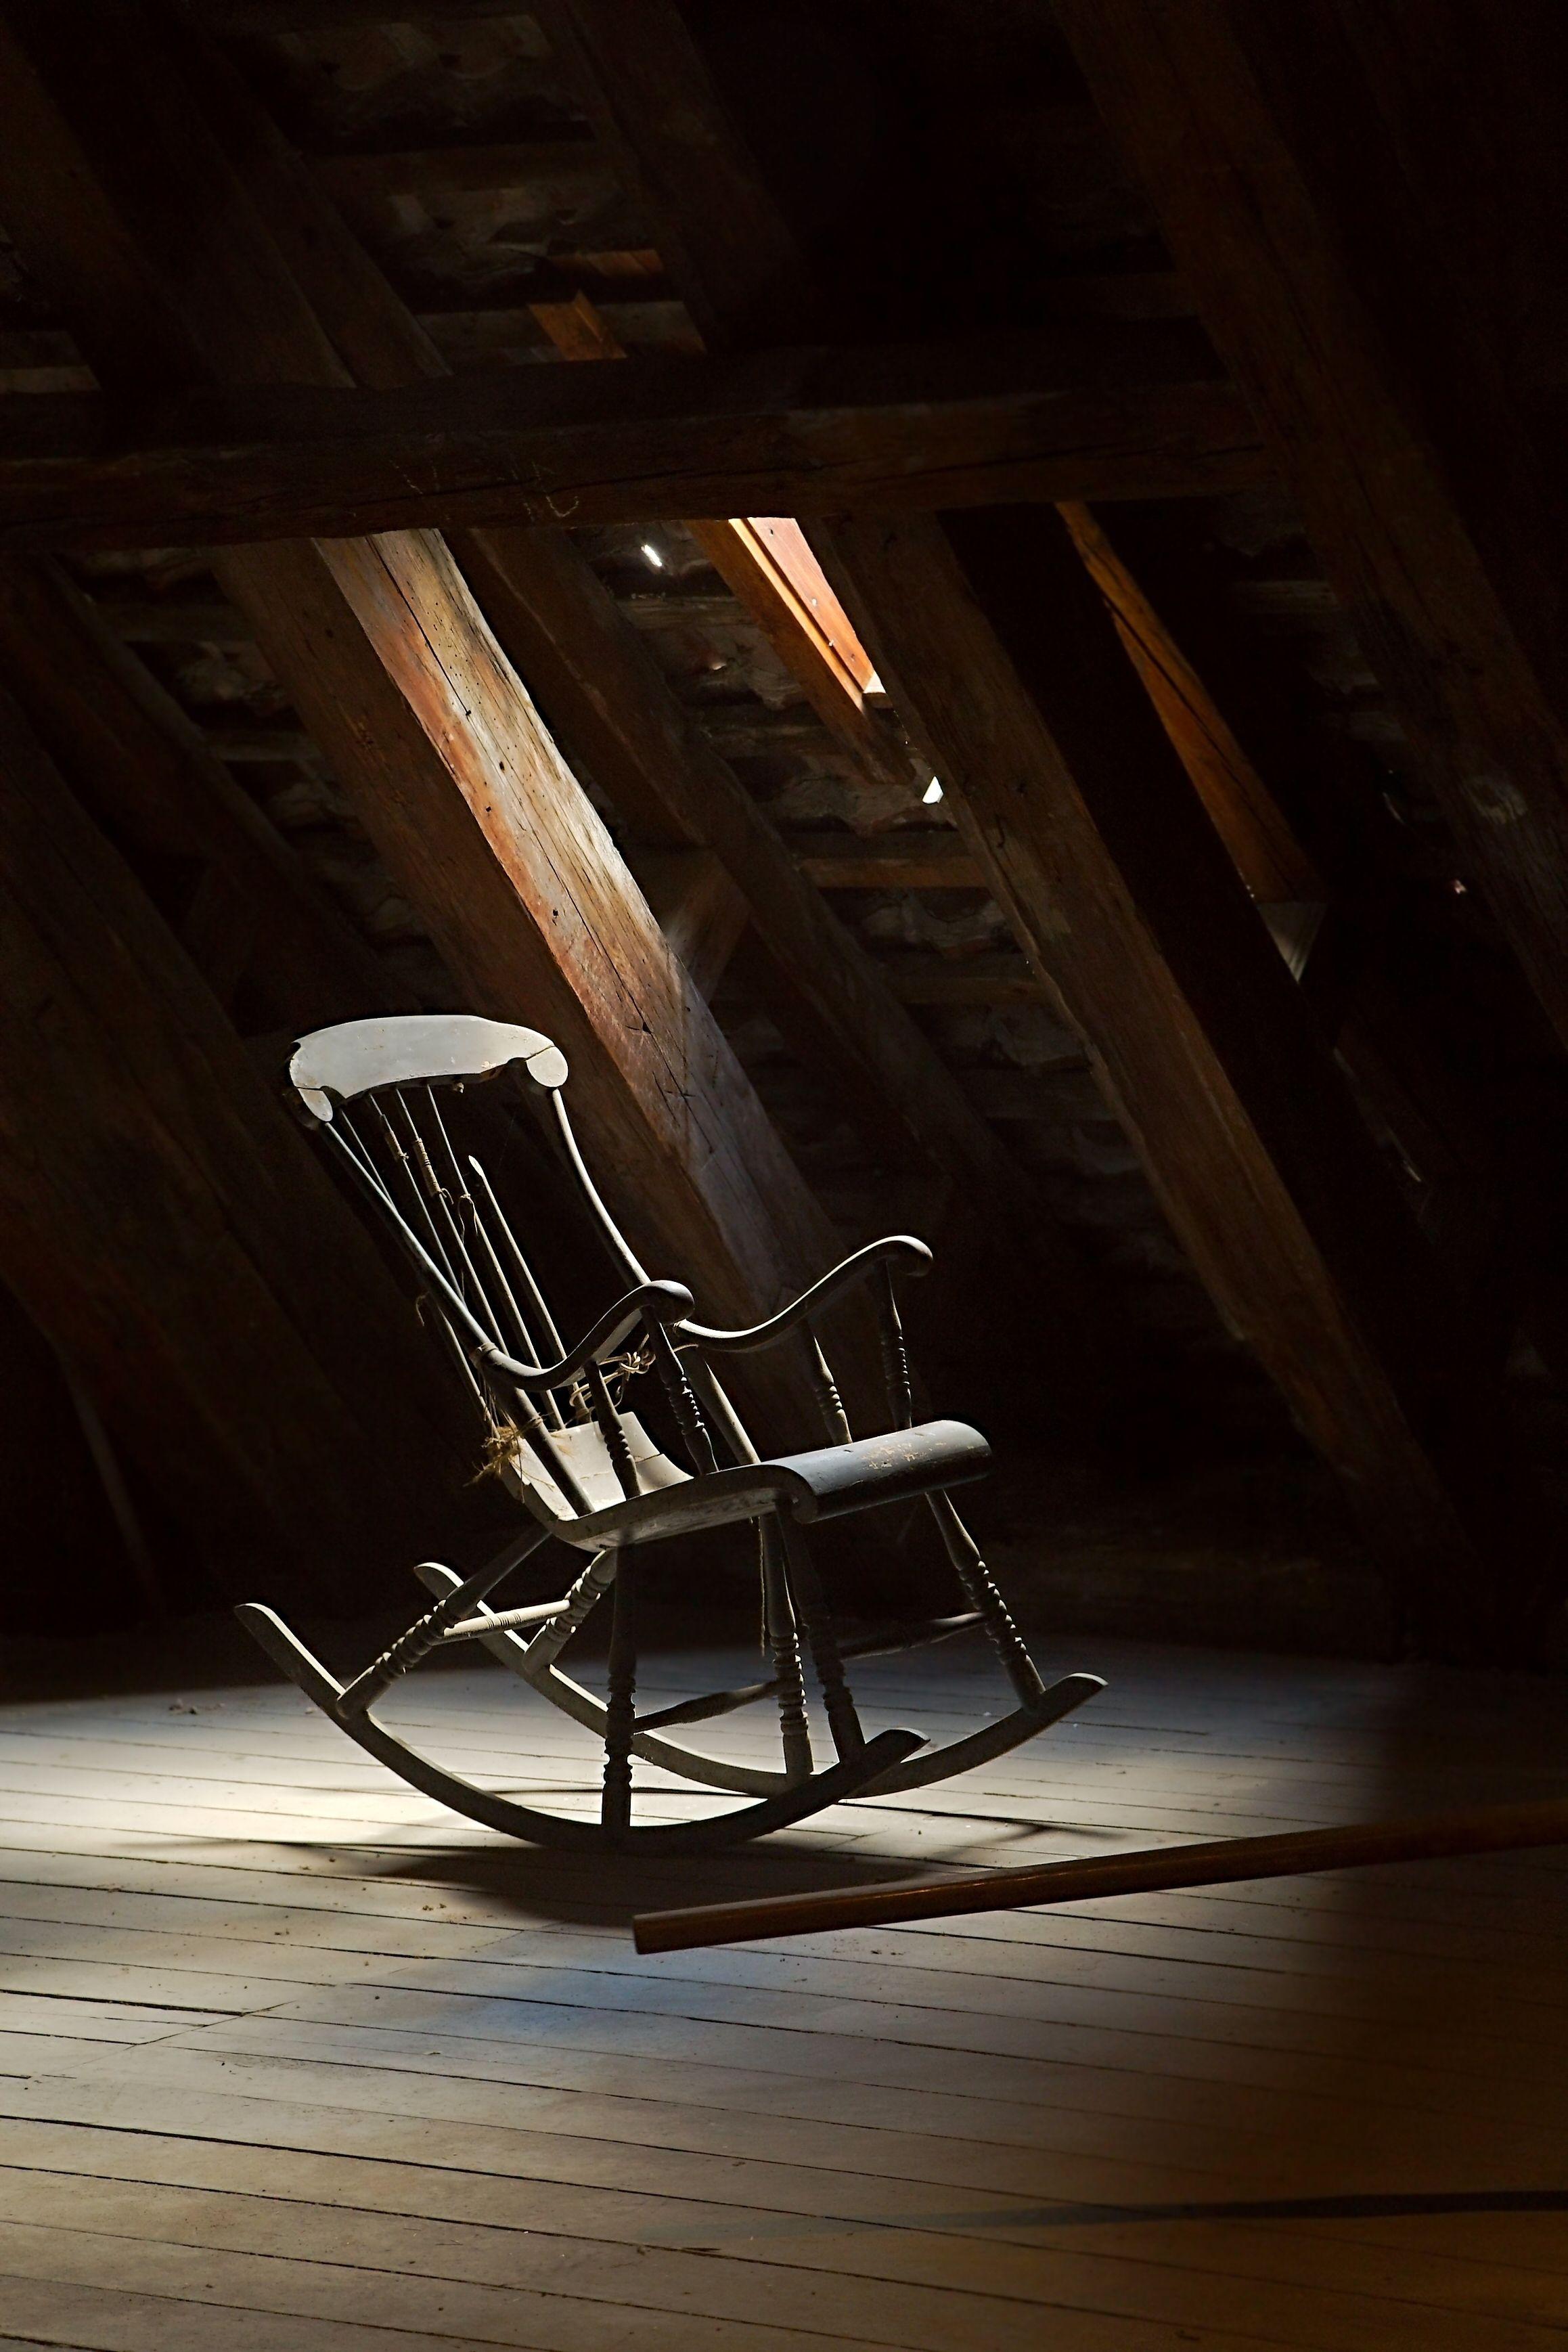 Antiquite Brocantr Antiquaire Inventaire De Meubles Antiques Antiquites Chaise Antique Commode Antique Objets Rare Old Rocking Chairs Rocking Chair Chair